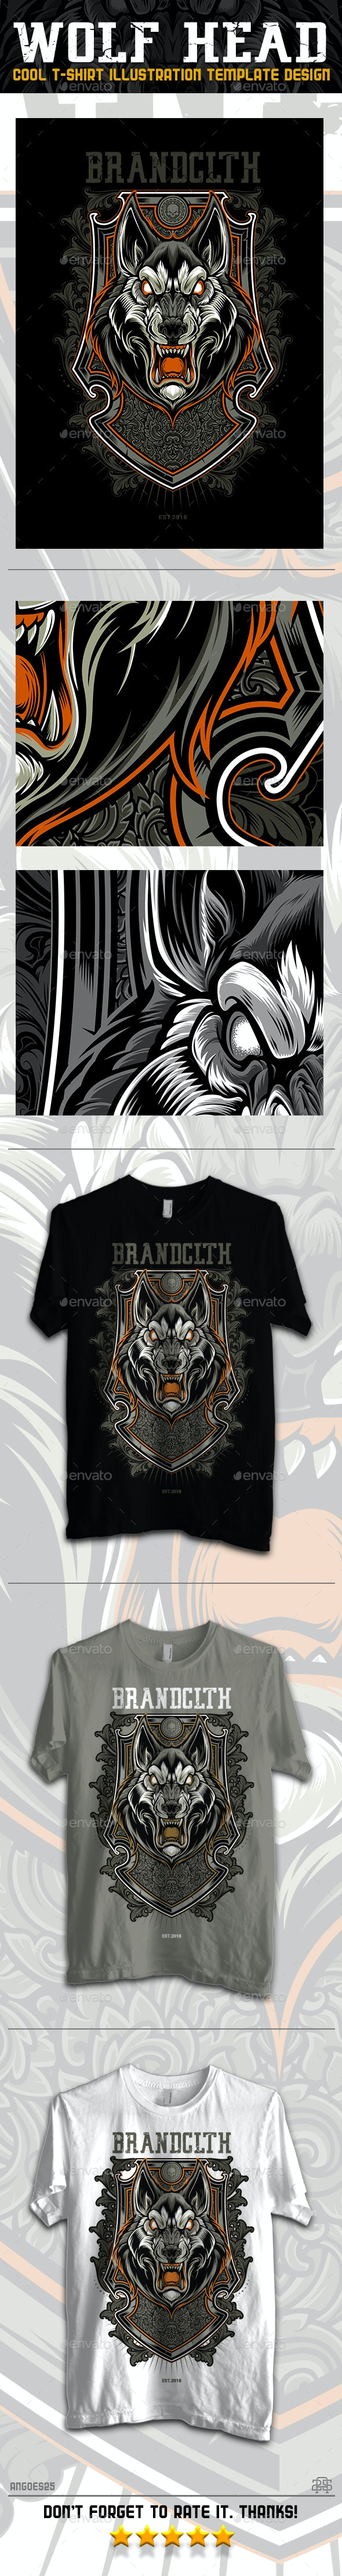 Wolf Head Illustration T-shirt Design Template - T-Shirts